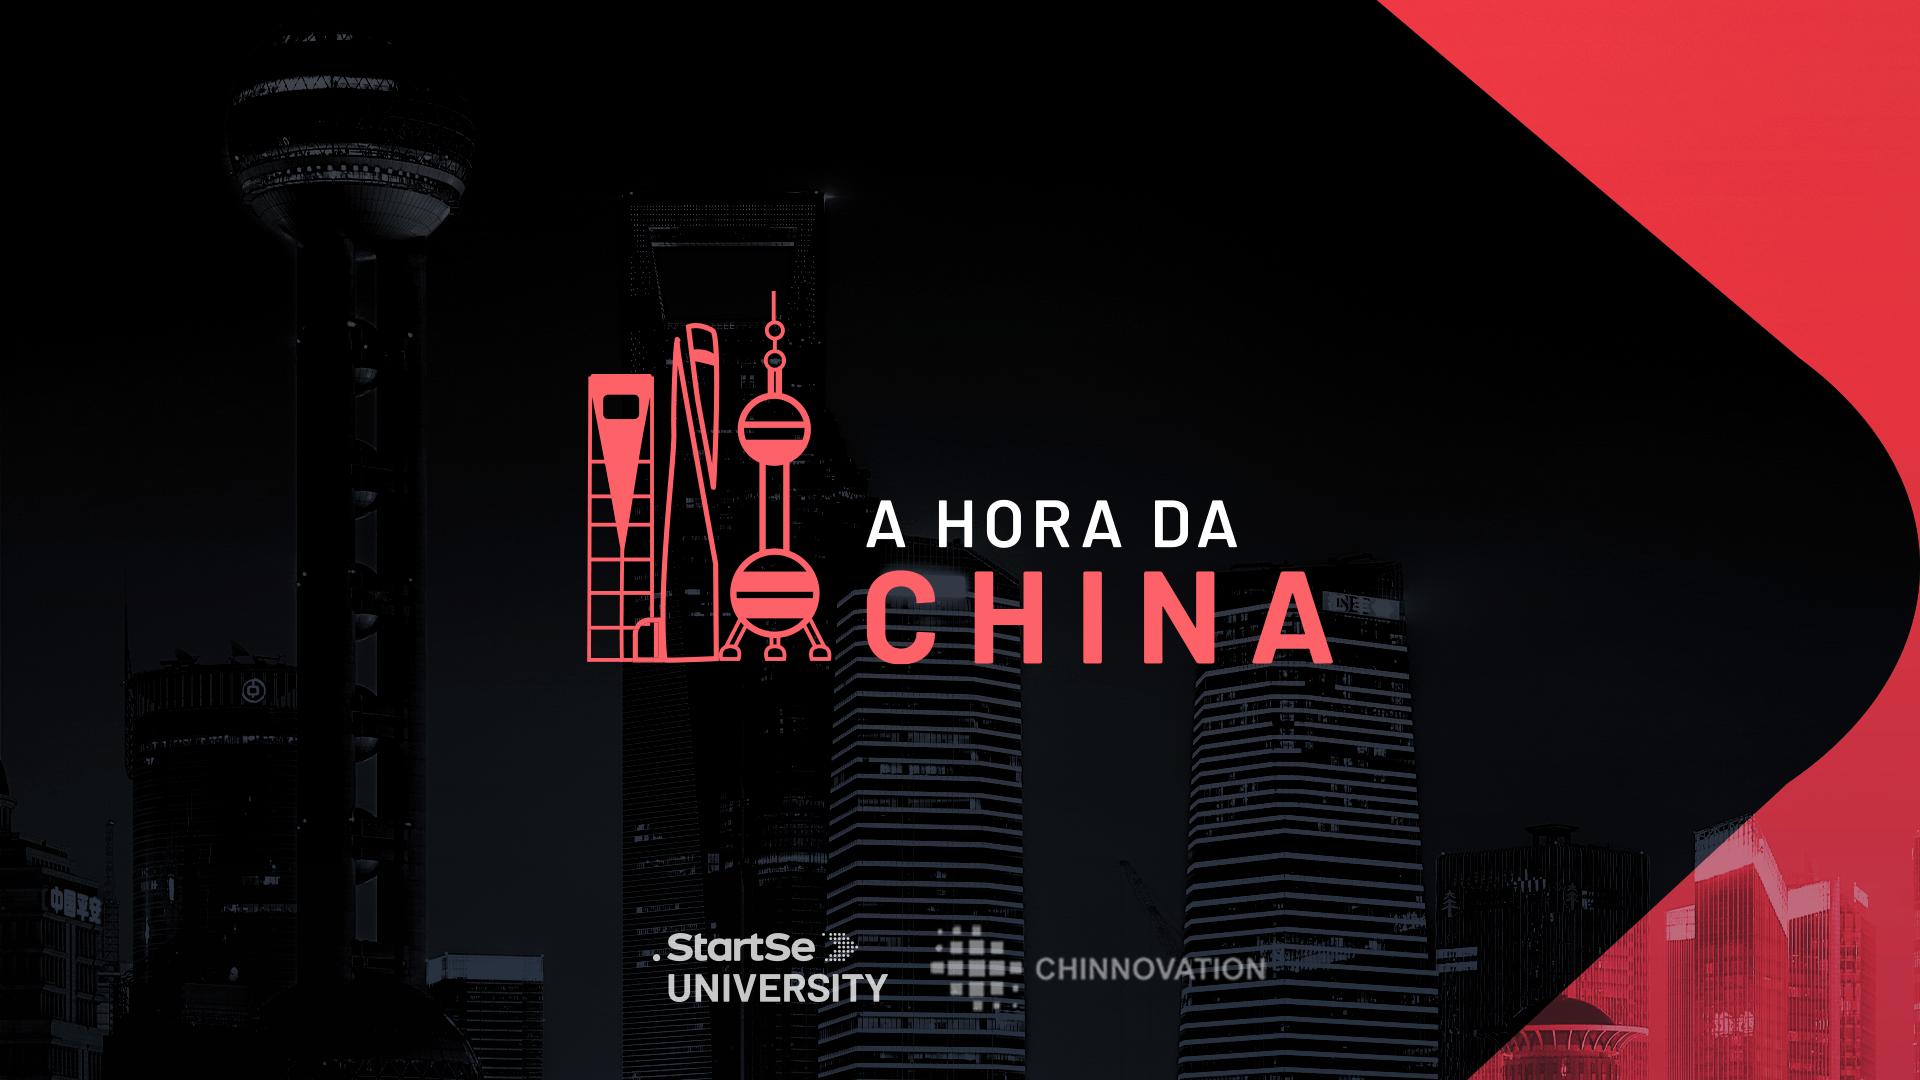 StartSe | A Hora da China